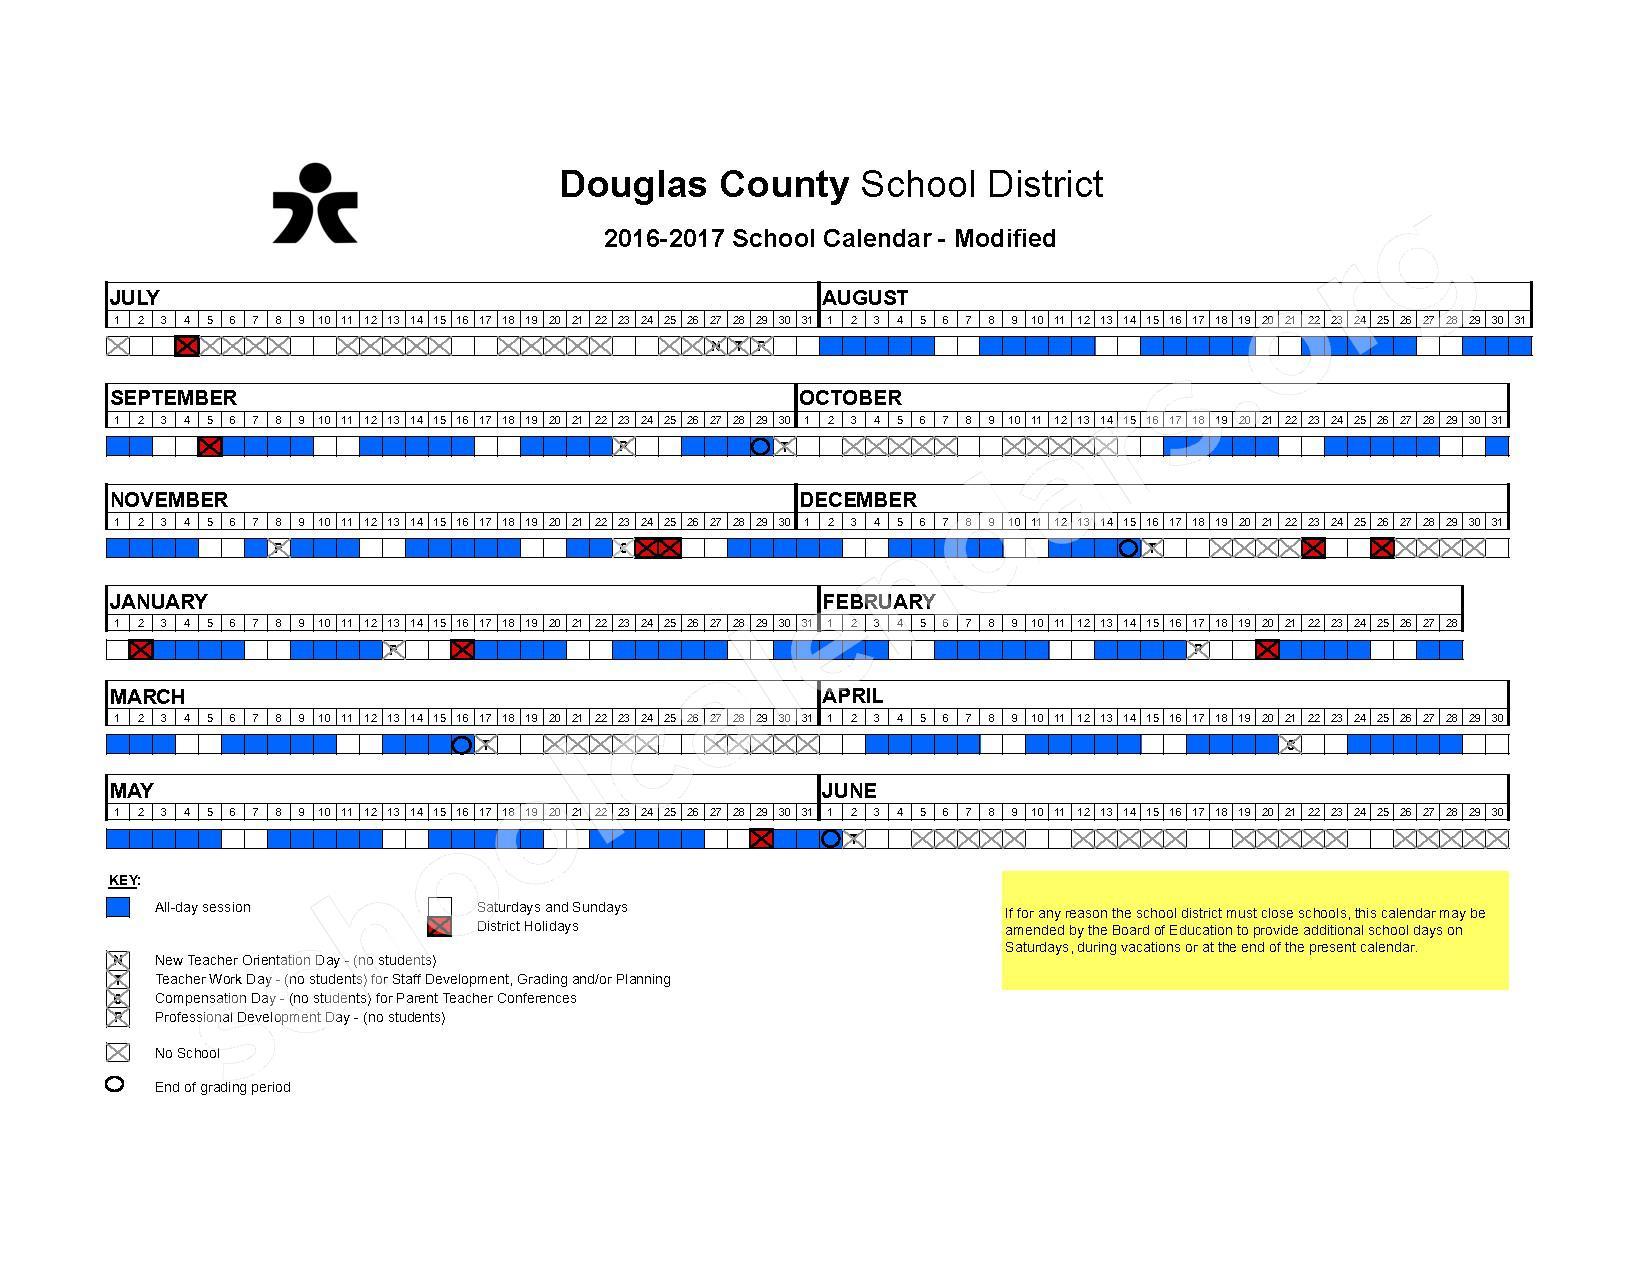 2016 - 2017 Modified School Calendar – Douglas County School District – page 1